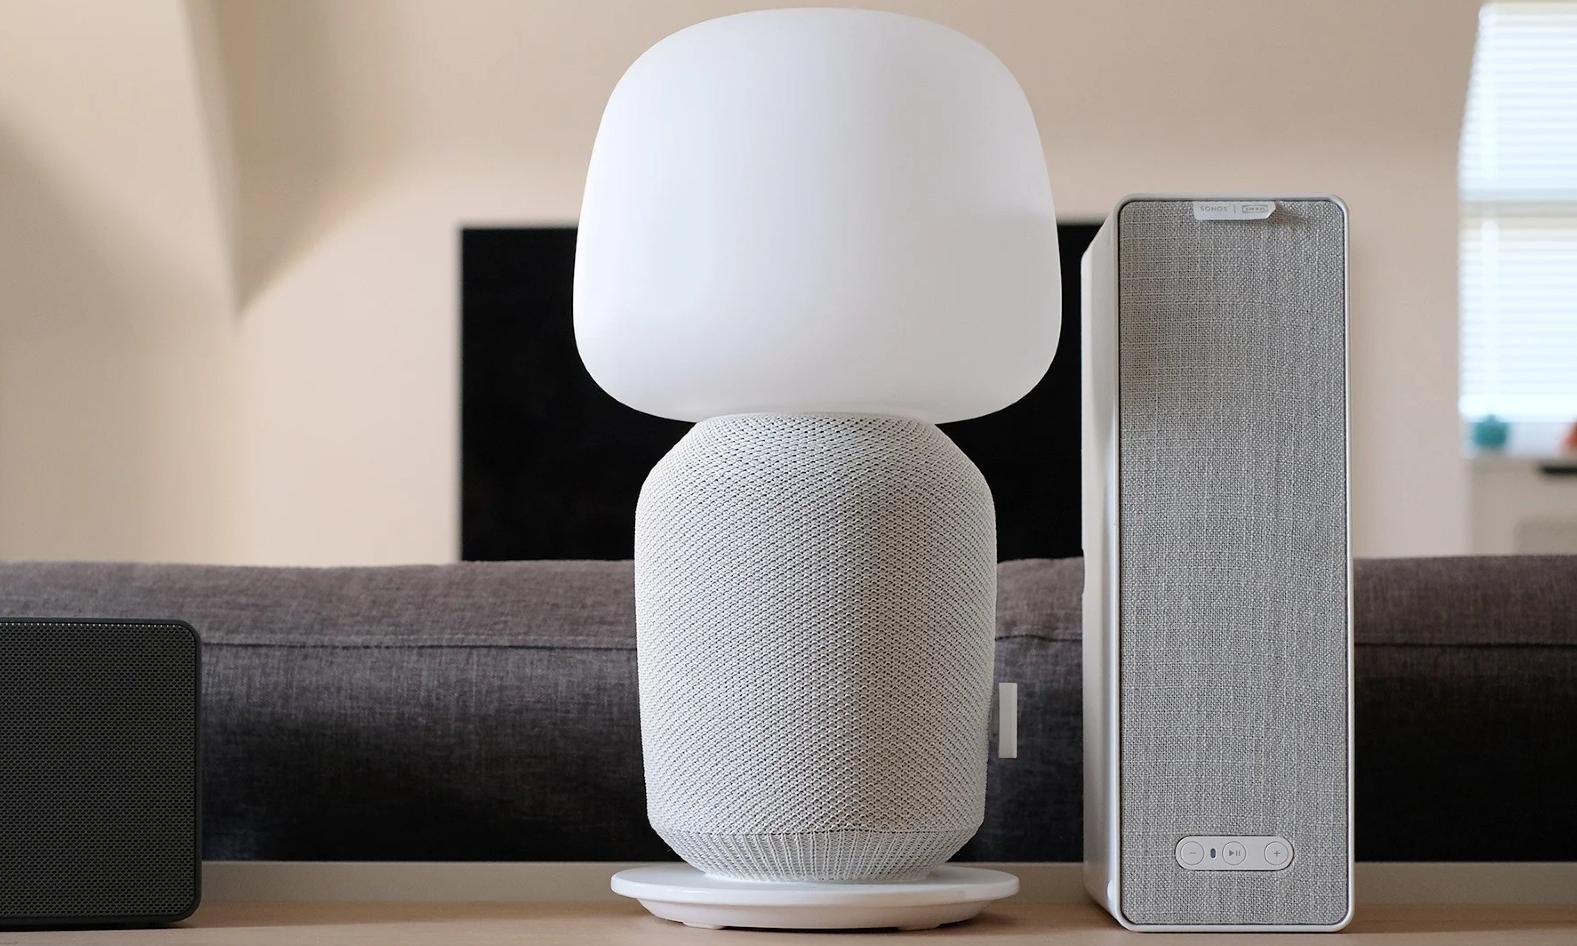 Sonos 和宜家正在合力开发可以作为「艺术品」的智能喇叭